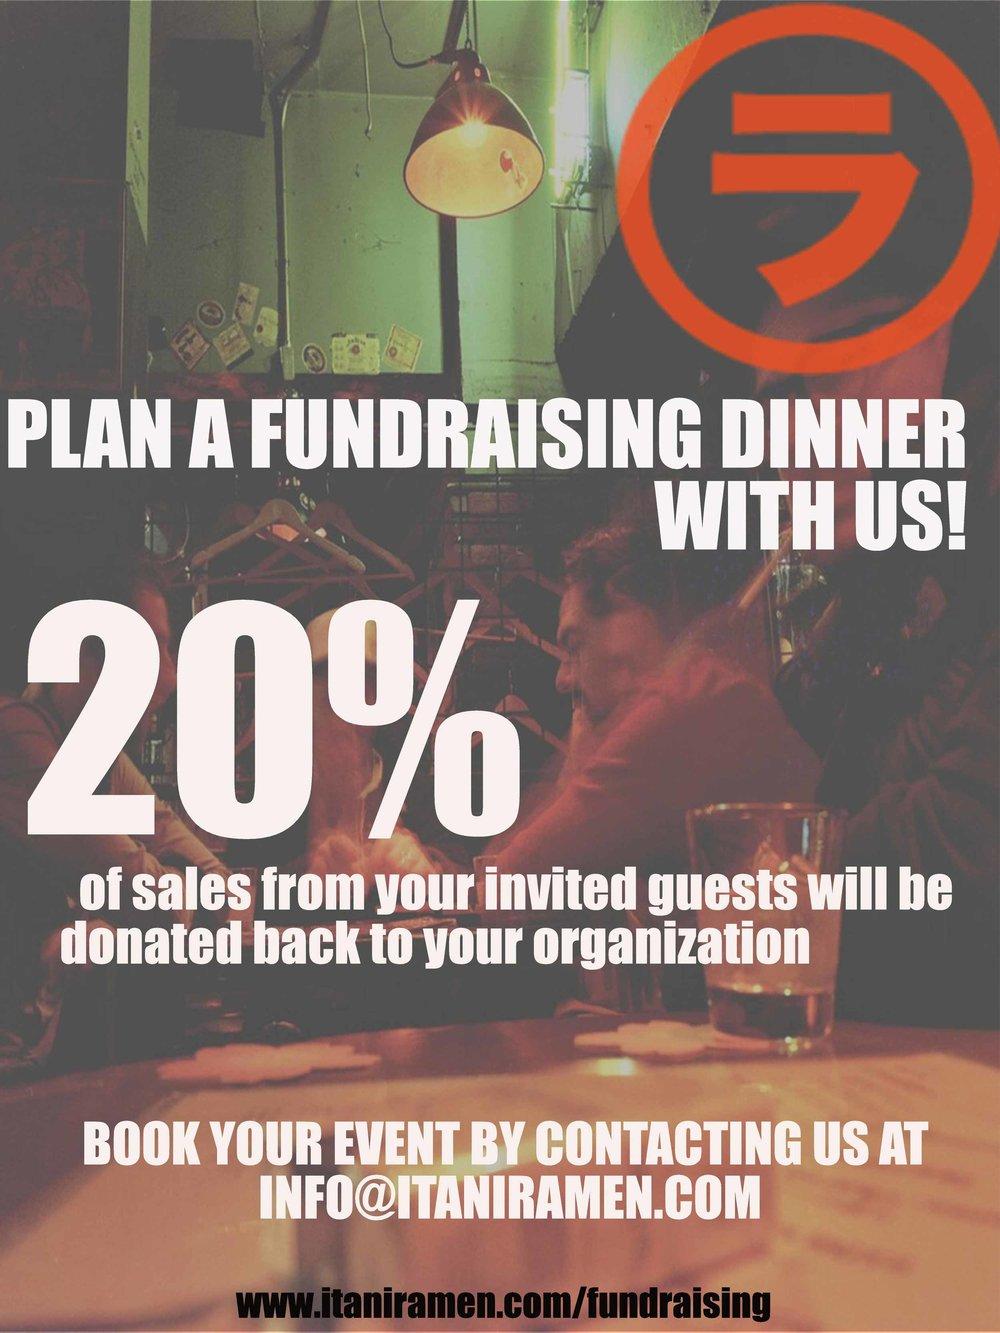 itani-ramen-fundraising-poster.jpg